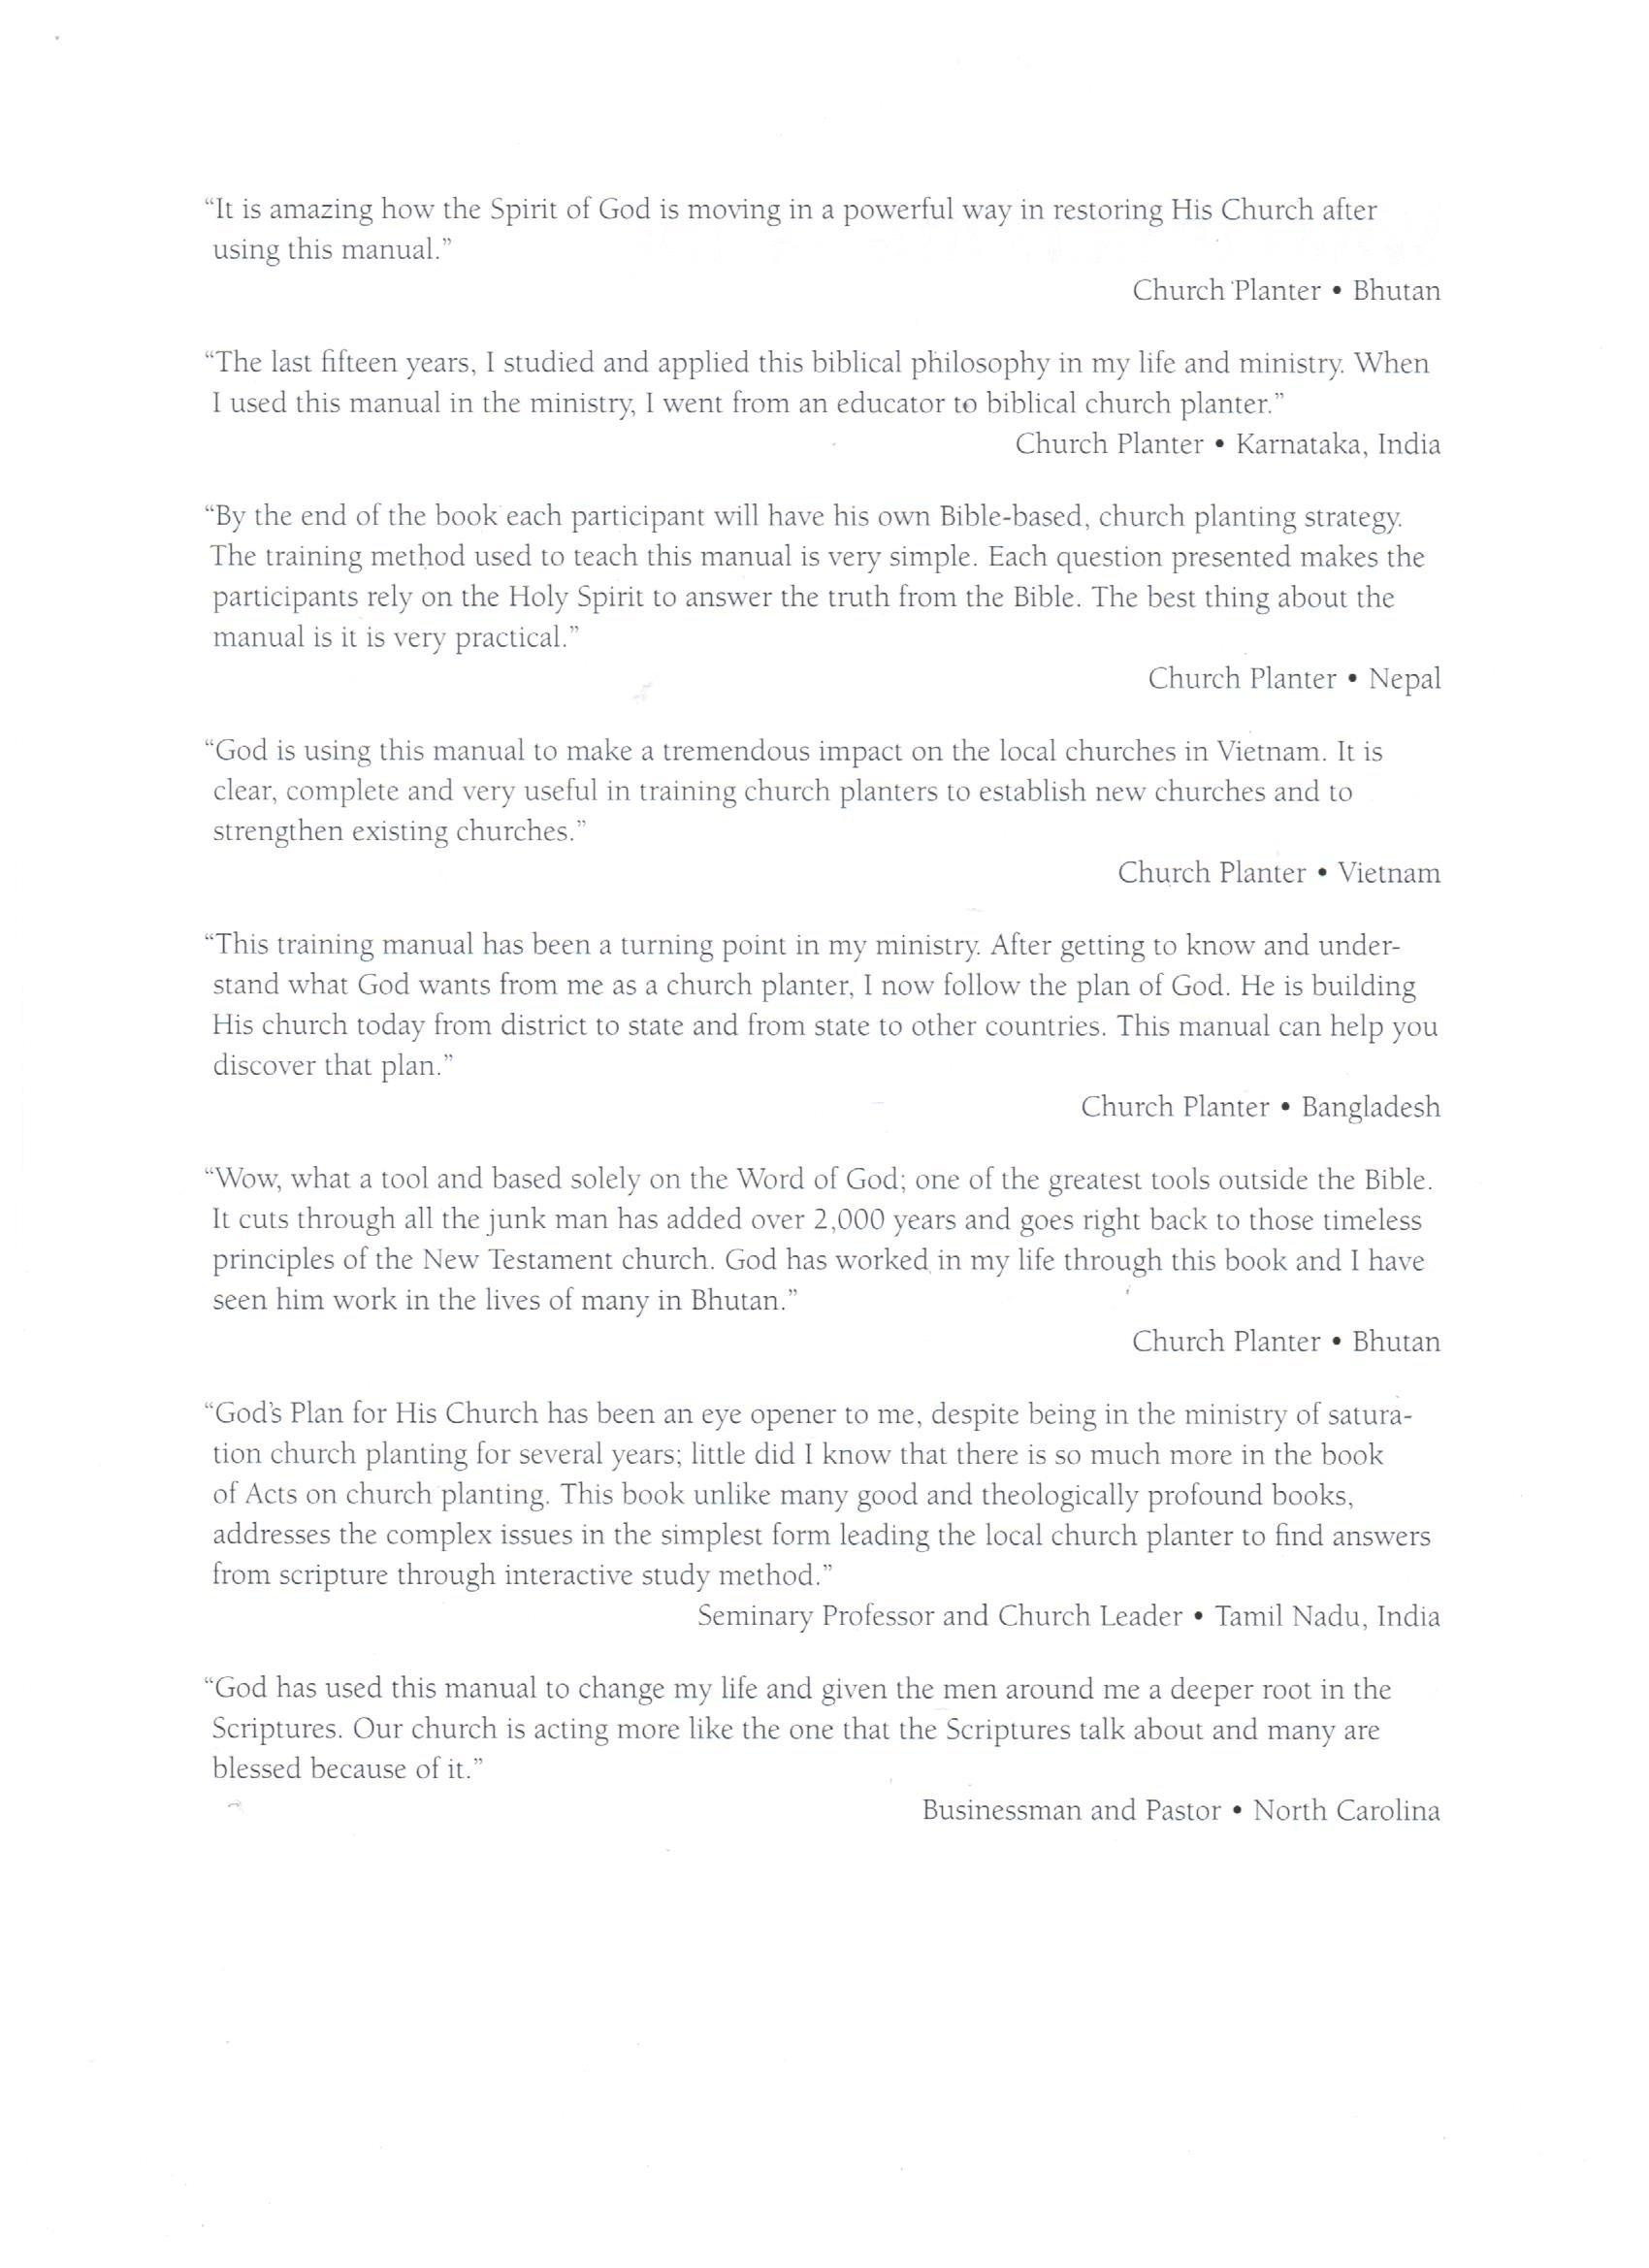 God's Plan for His Church : A Manual for Church Planting and Church  Renewal: Tim W Bunn: 9780983301622: Amazon.com: Books